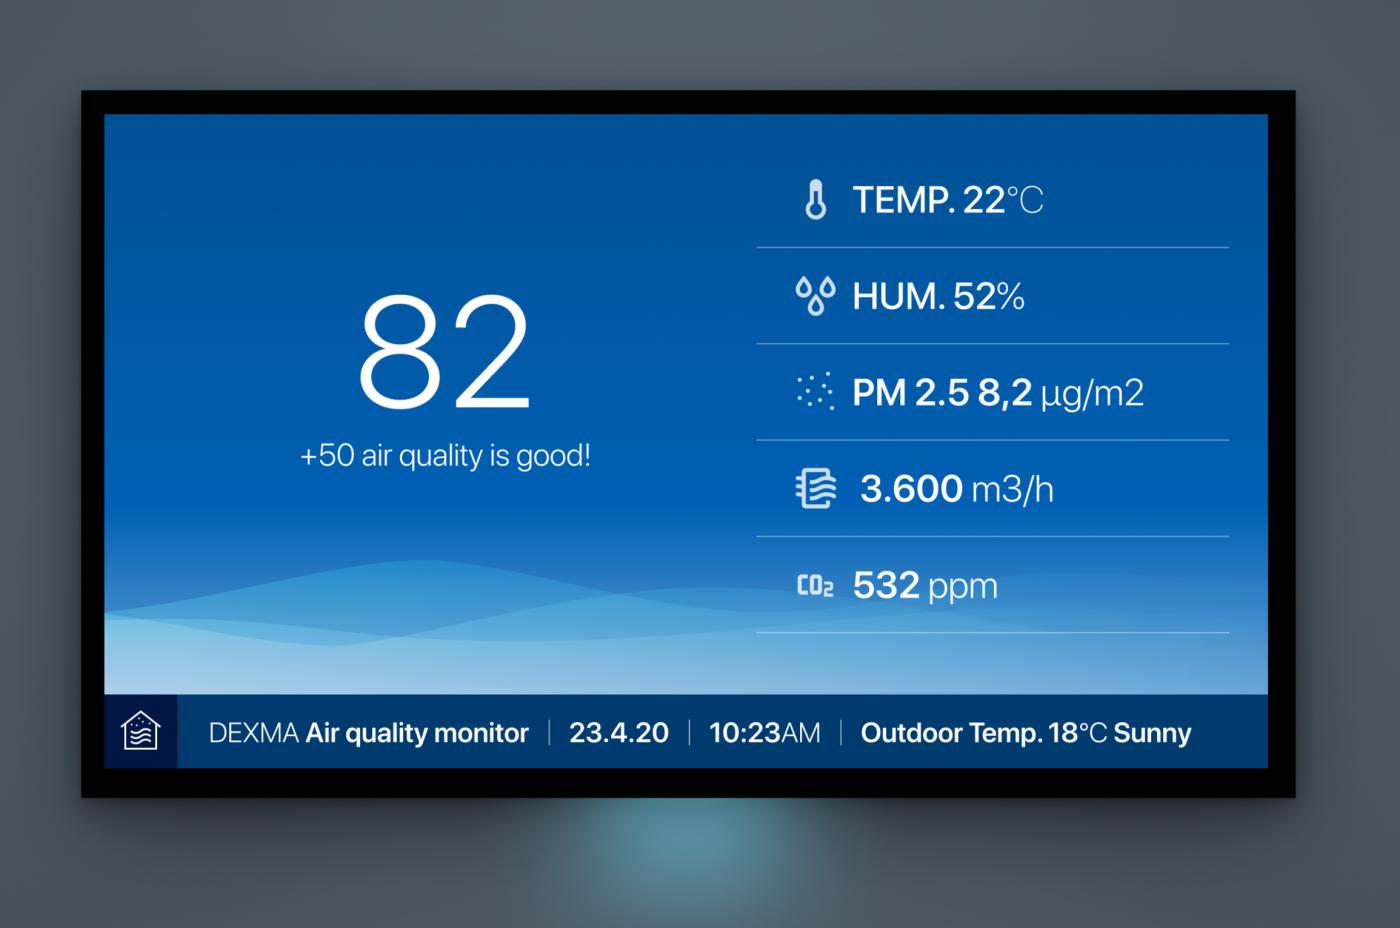 DEXMA Air Quality monitor